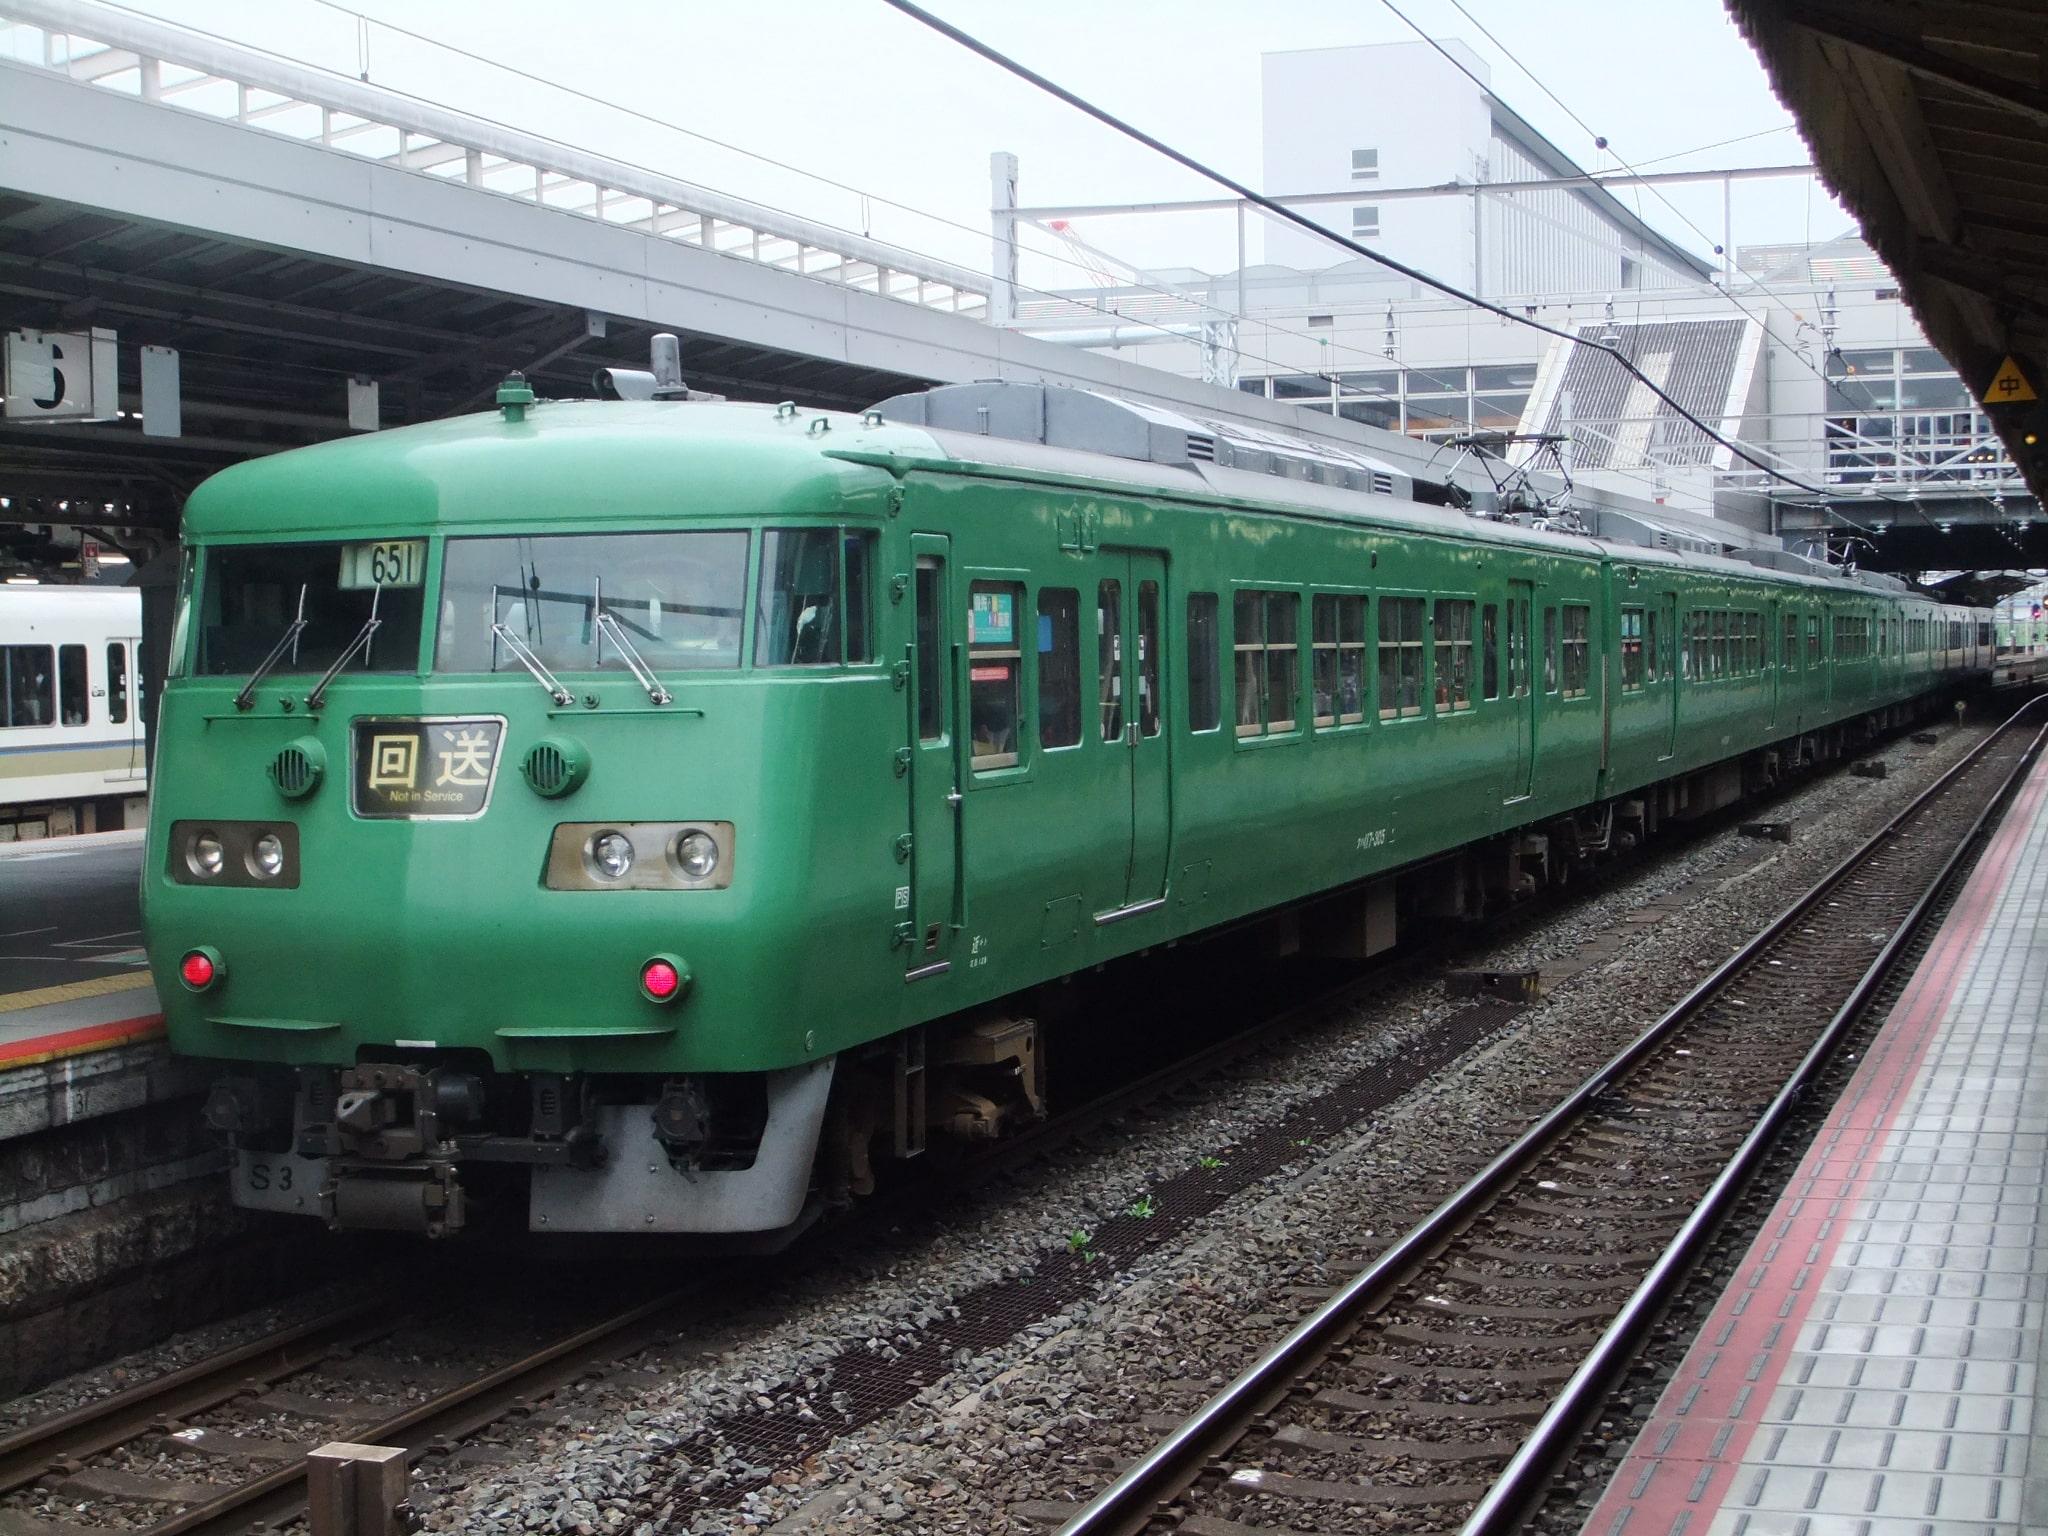 cd871202403250193401ecb42ff7f958 - JR西日本、新たな長距離列車を発表